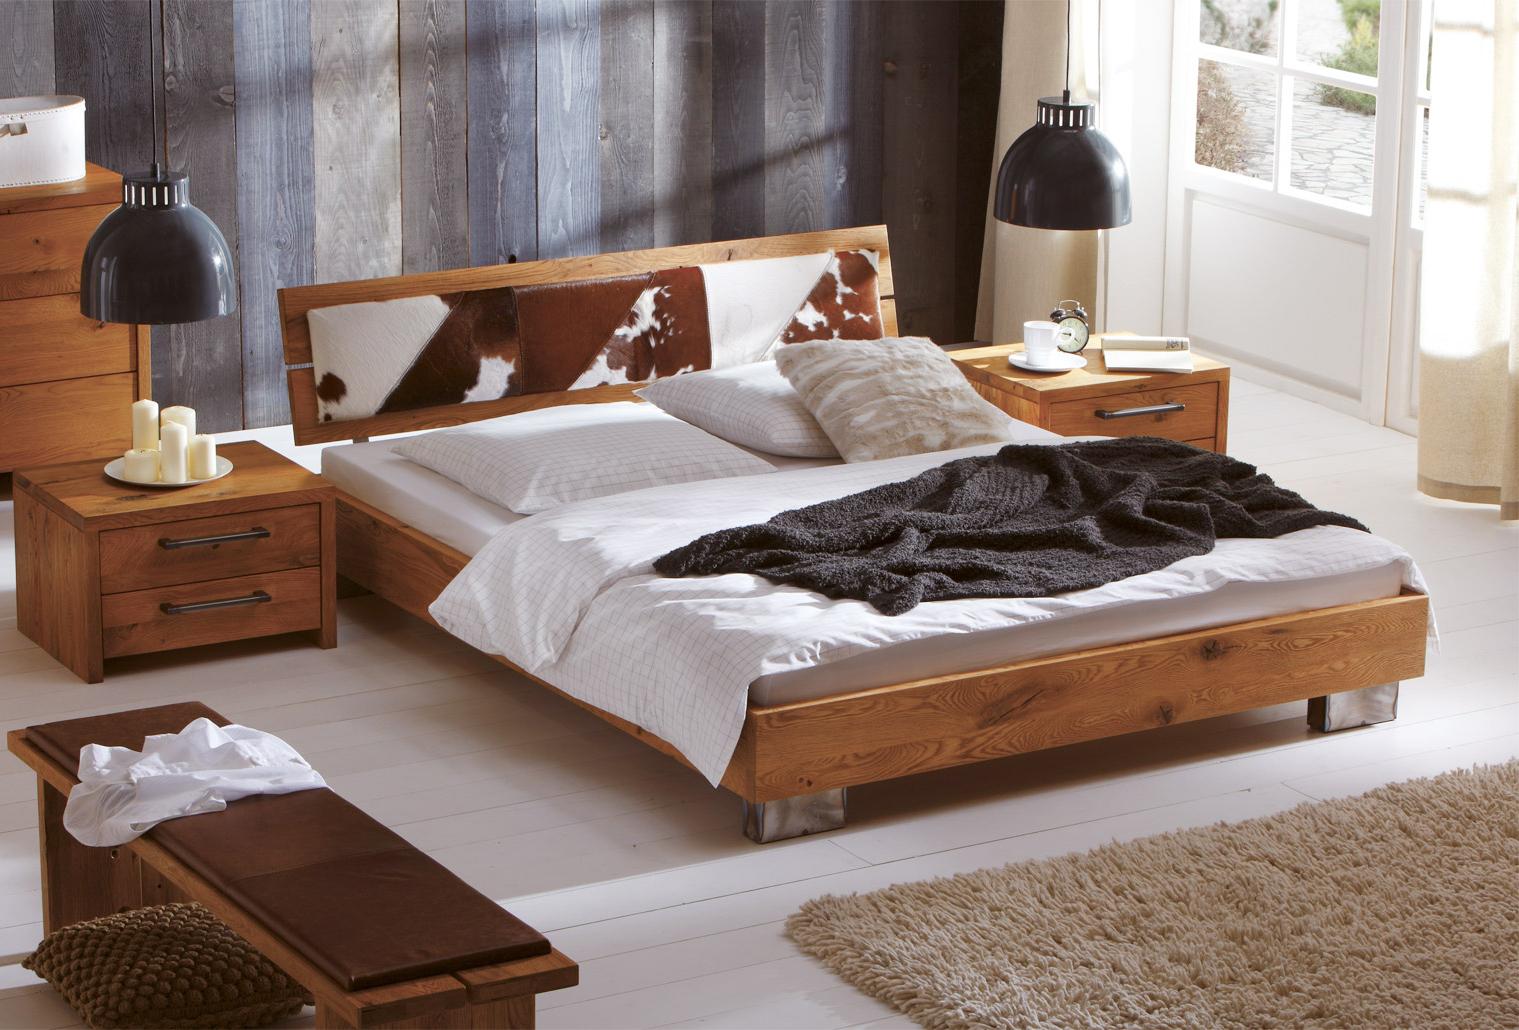 Schlafzimmer Rustikal schlafzimmer rustikal badezimmer schlafzimmer sessel möbel